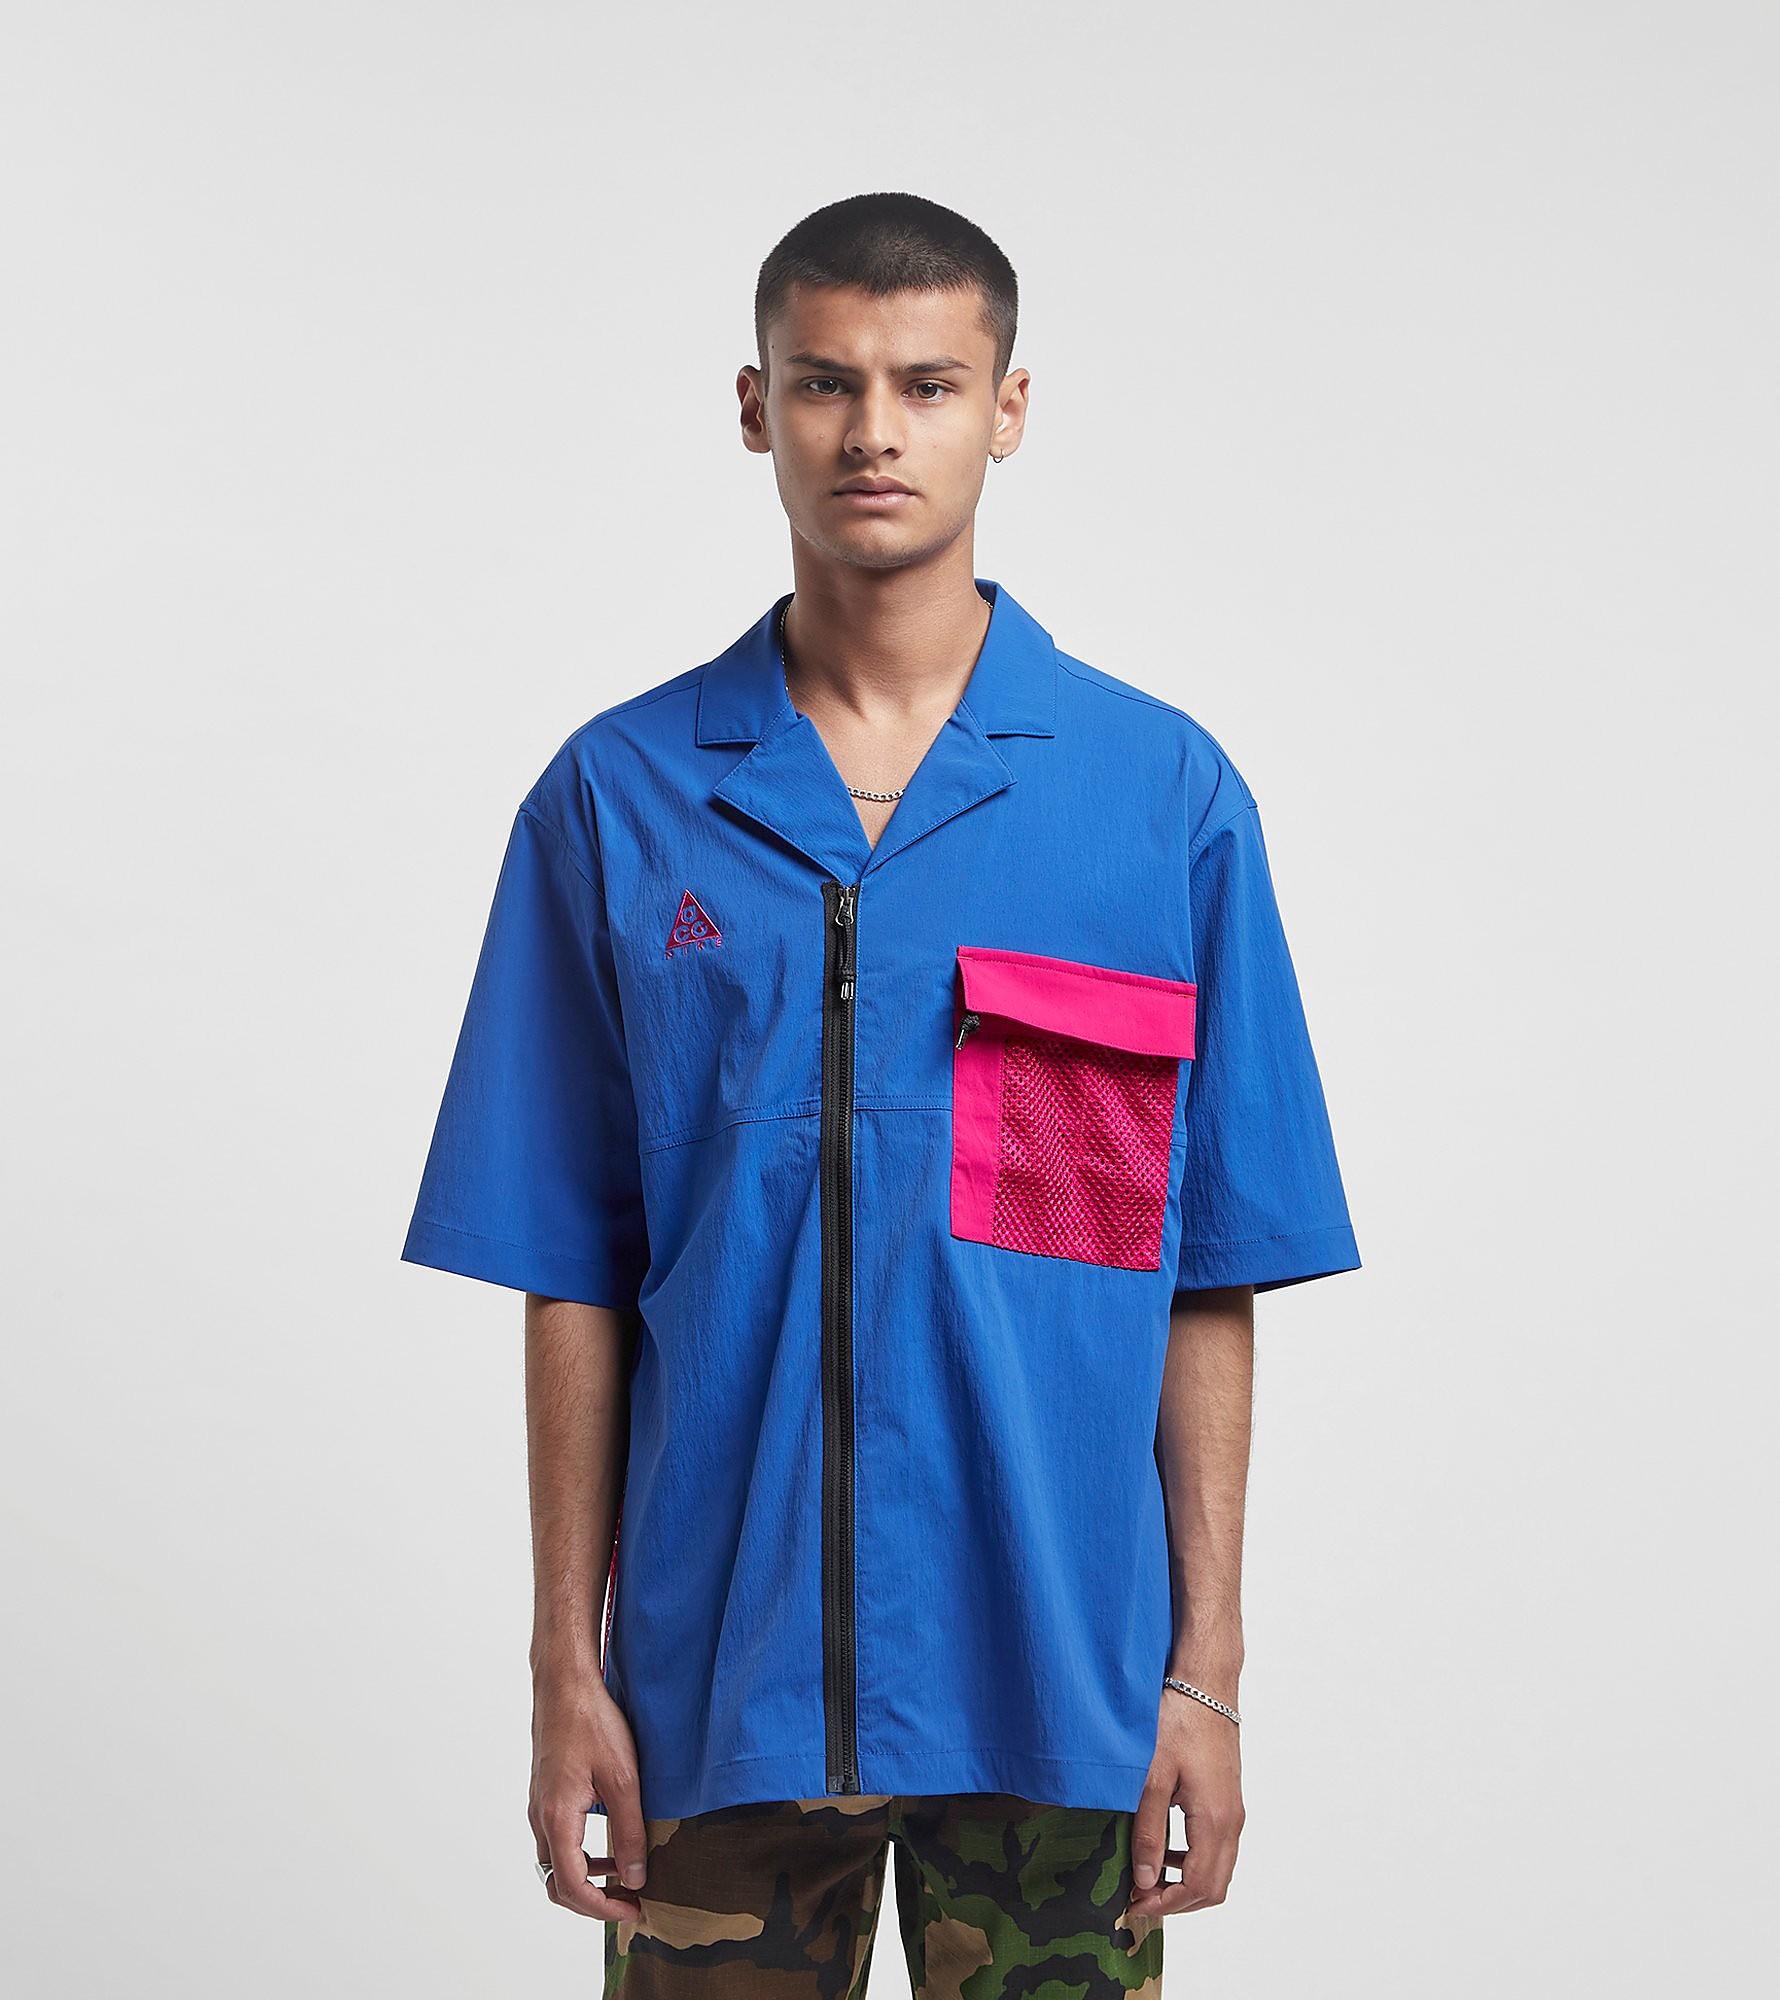 Nike Chemise ACG, Bleu